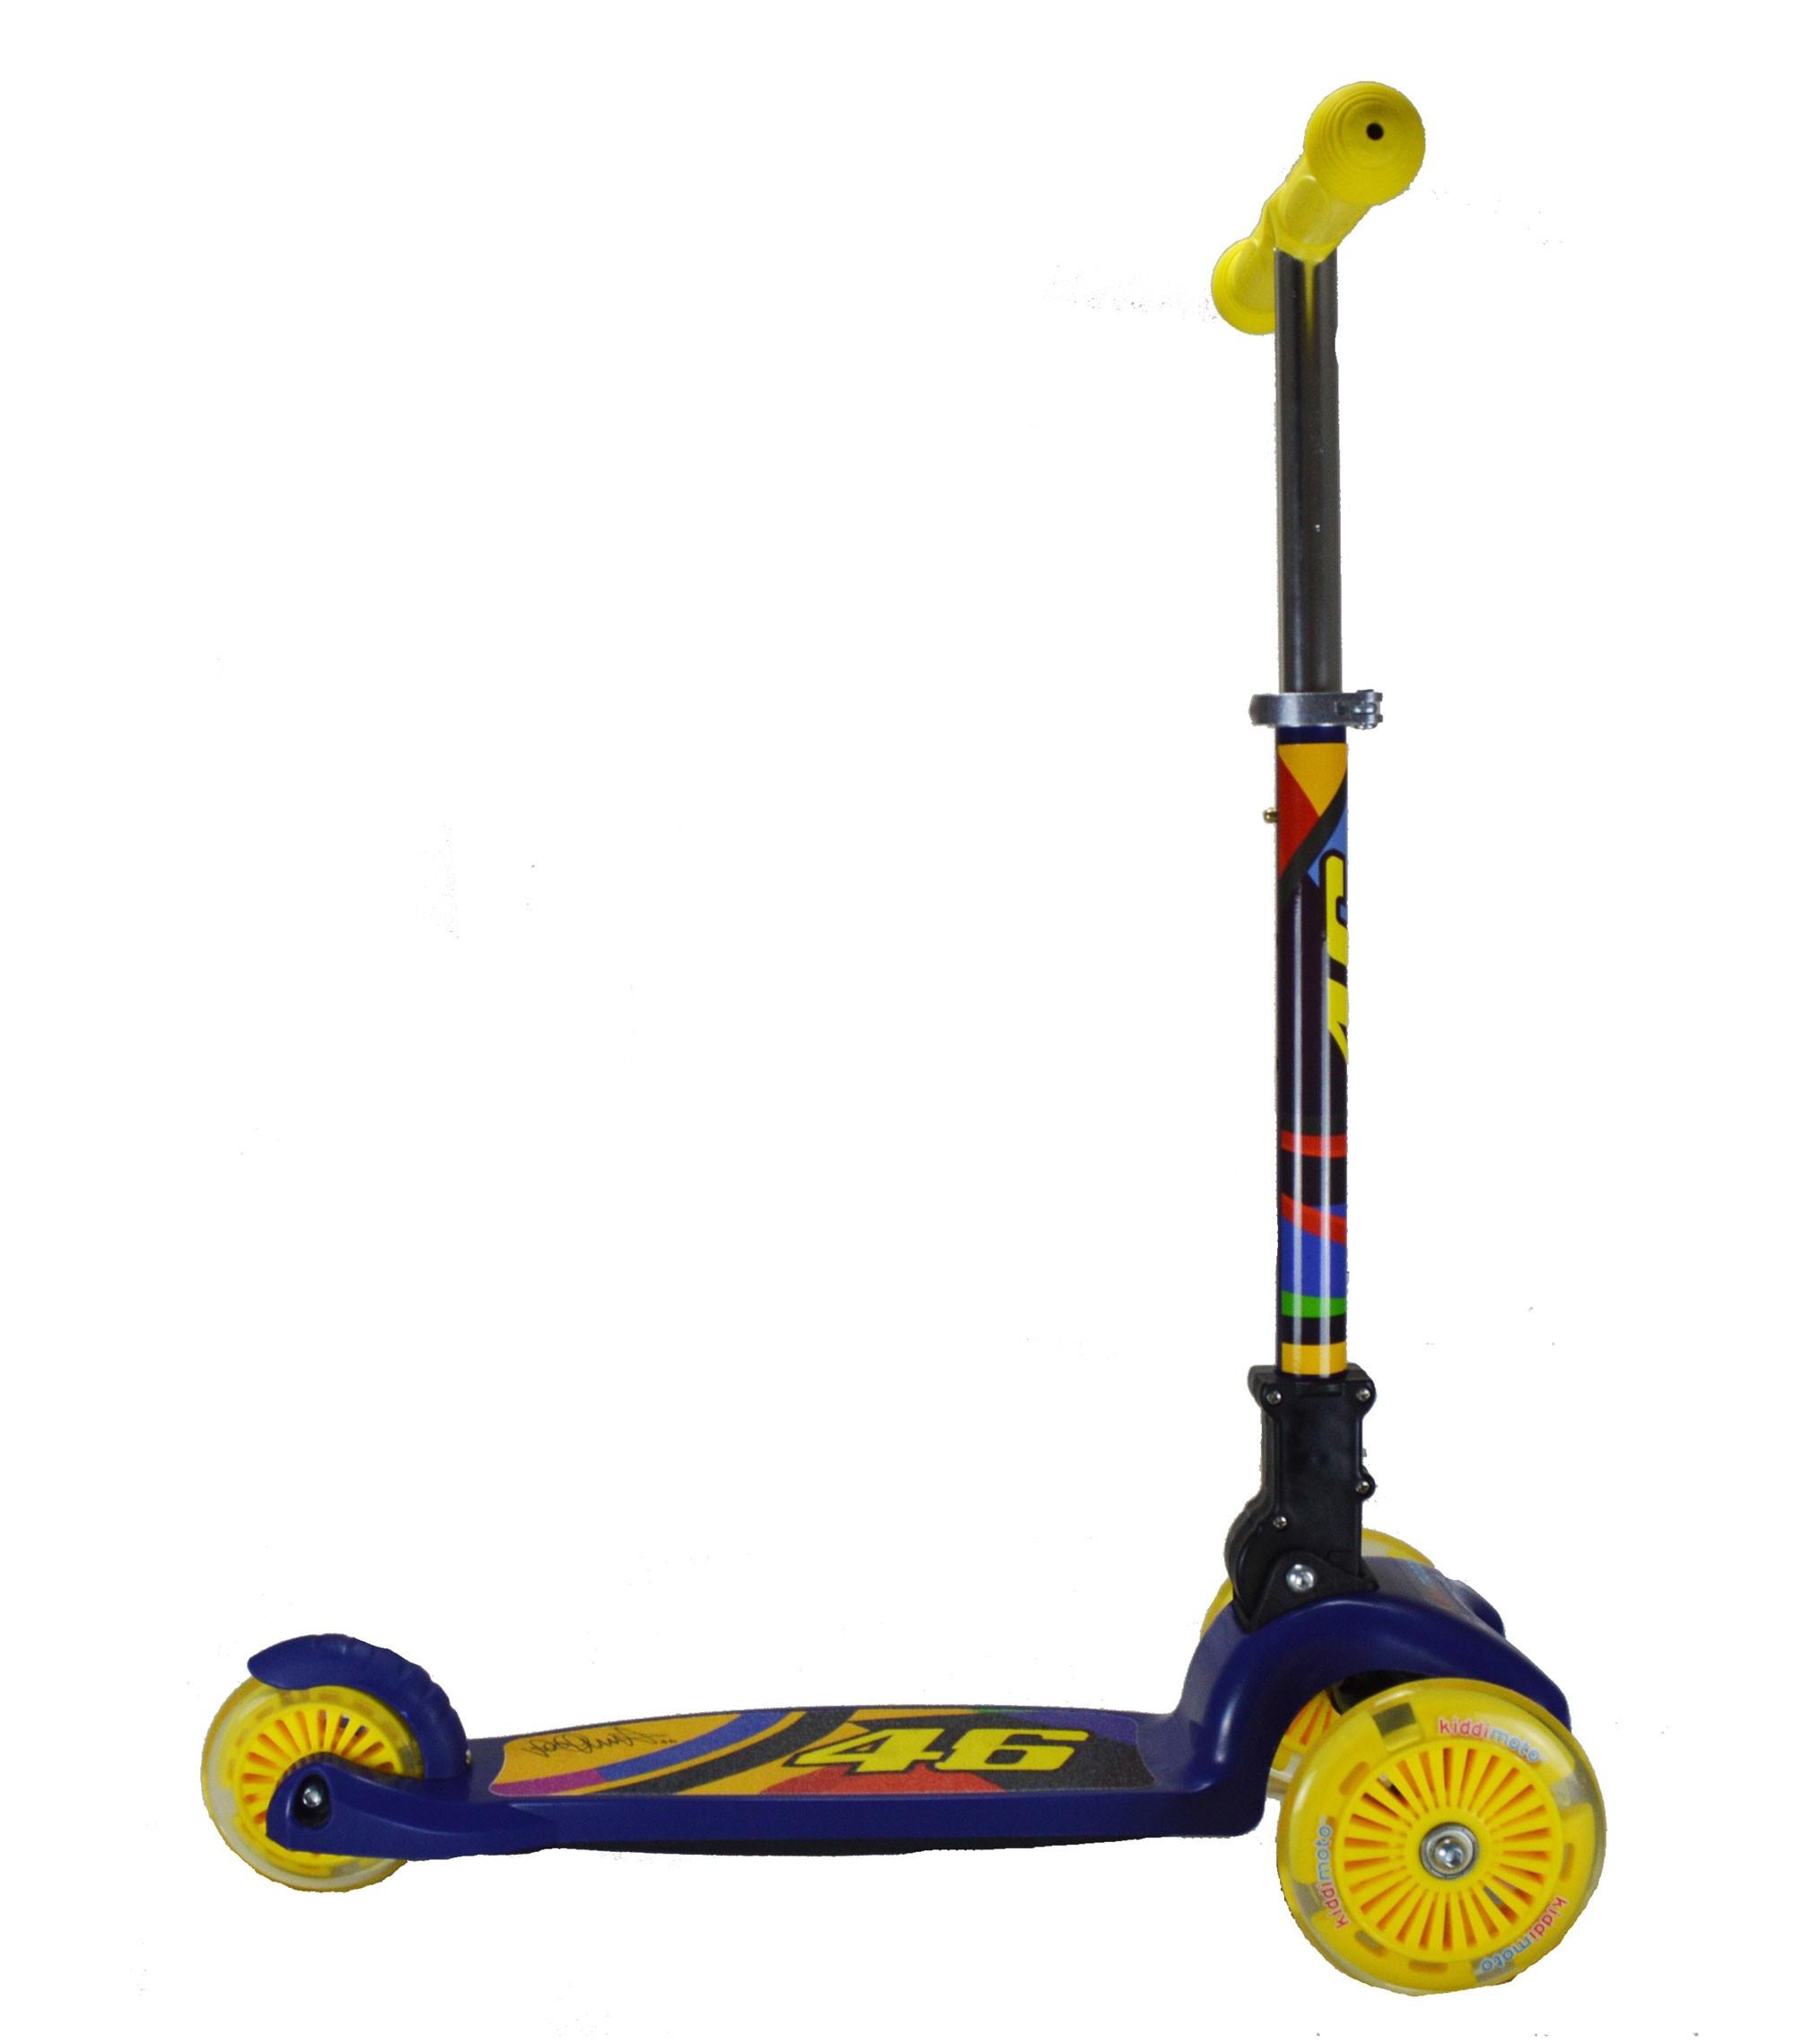 kiddimoto Scooter / Kinderroller U-Zoom Scooter LED Valentino Rossi Bild 2